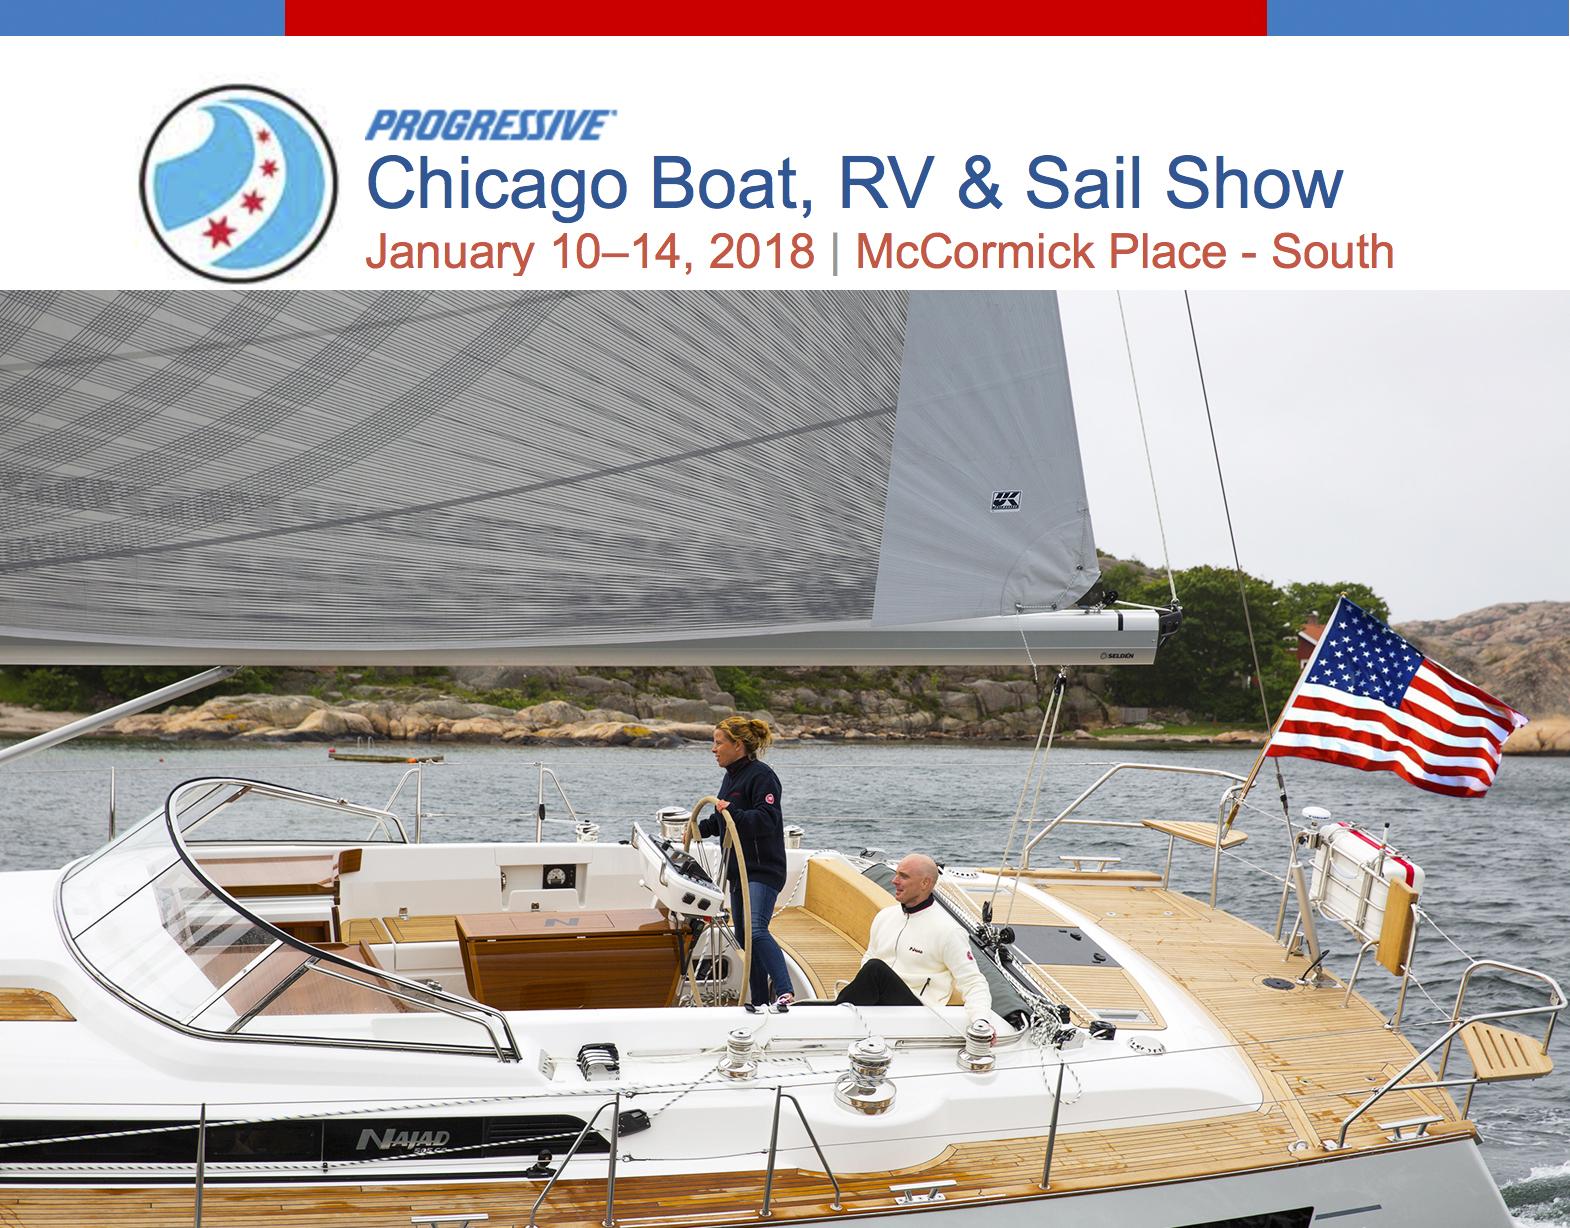 ChicagoBoatShowComposite.jpg